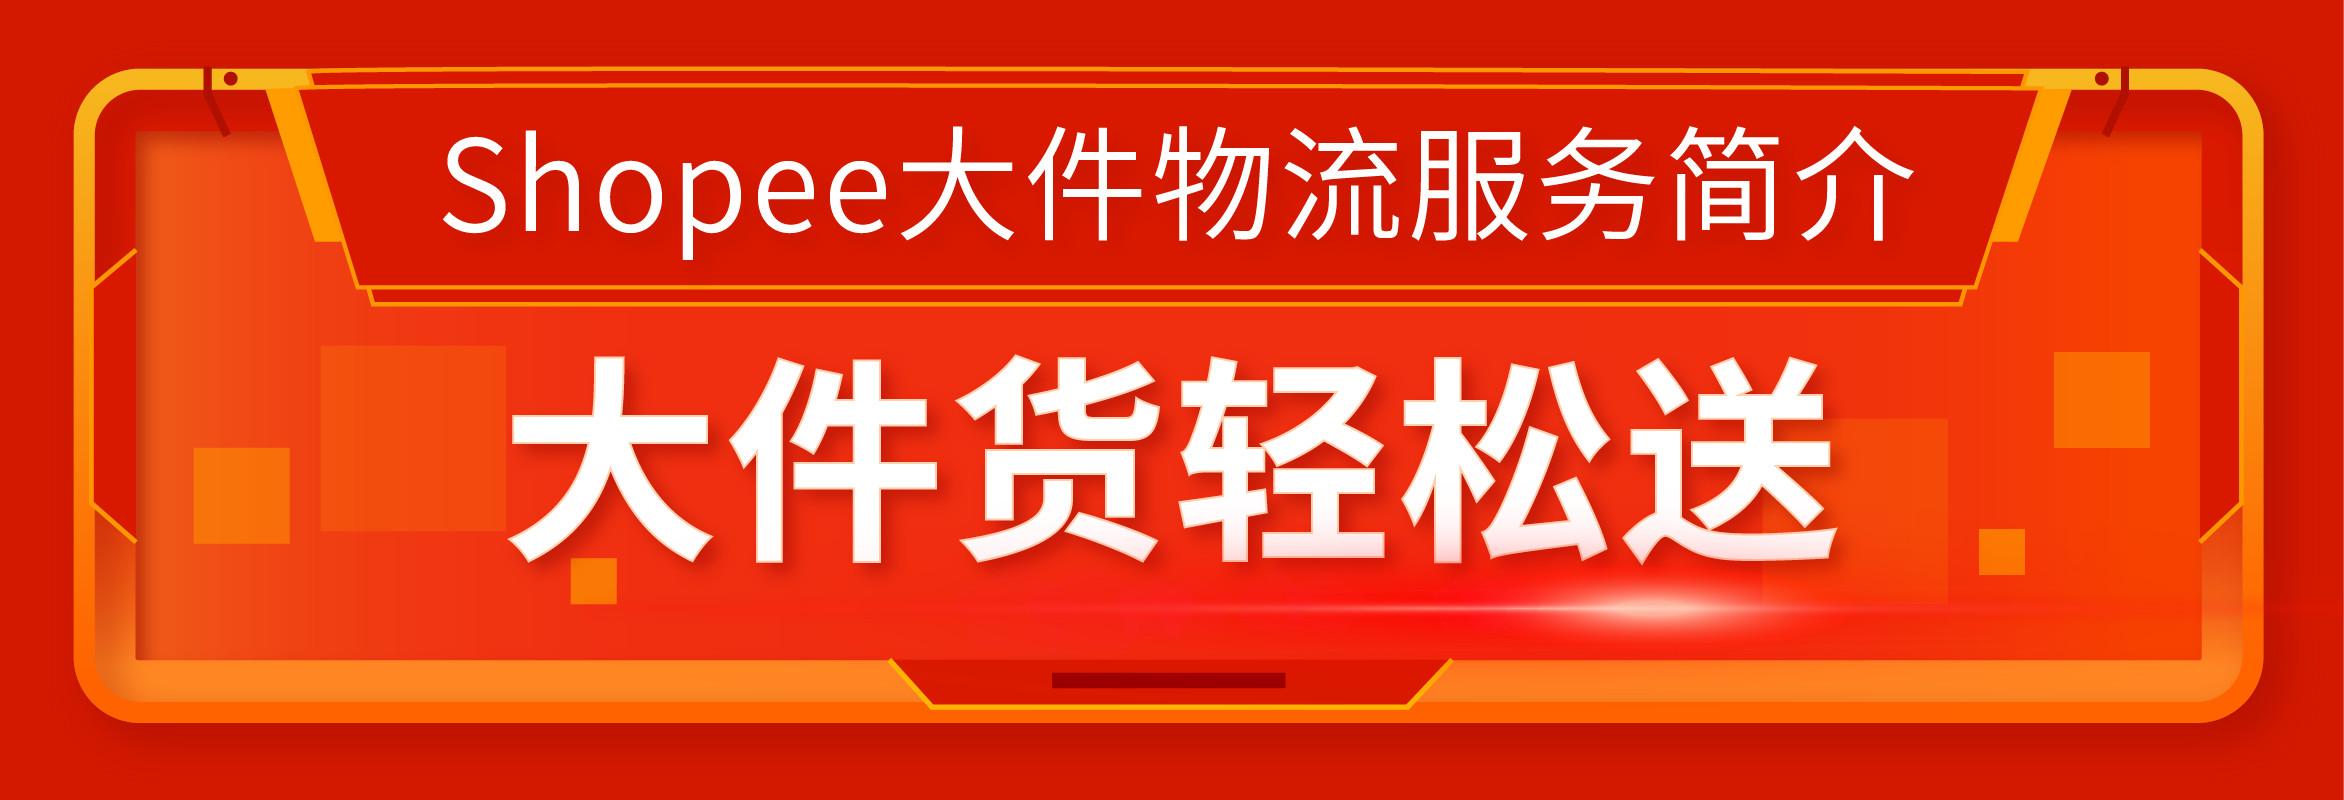 Shopee大件物流服务简介.jpg